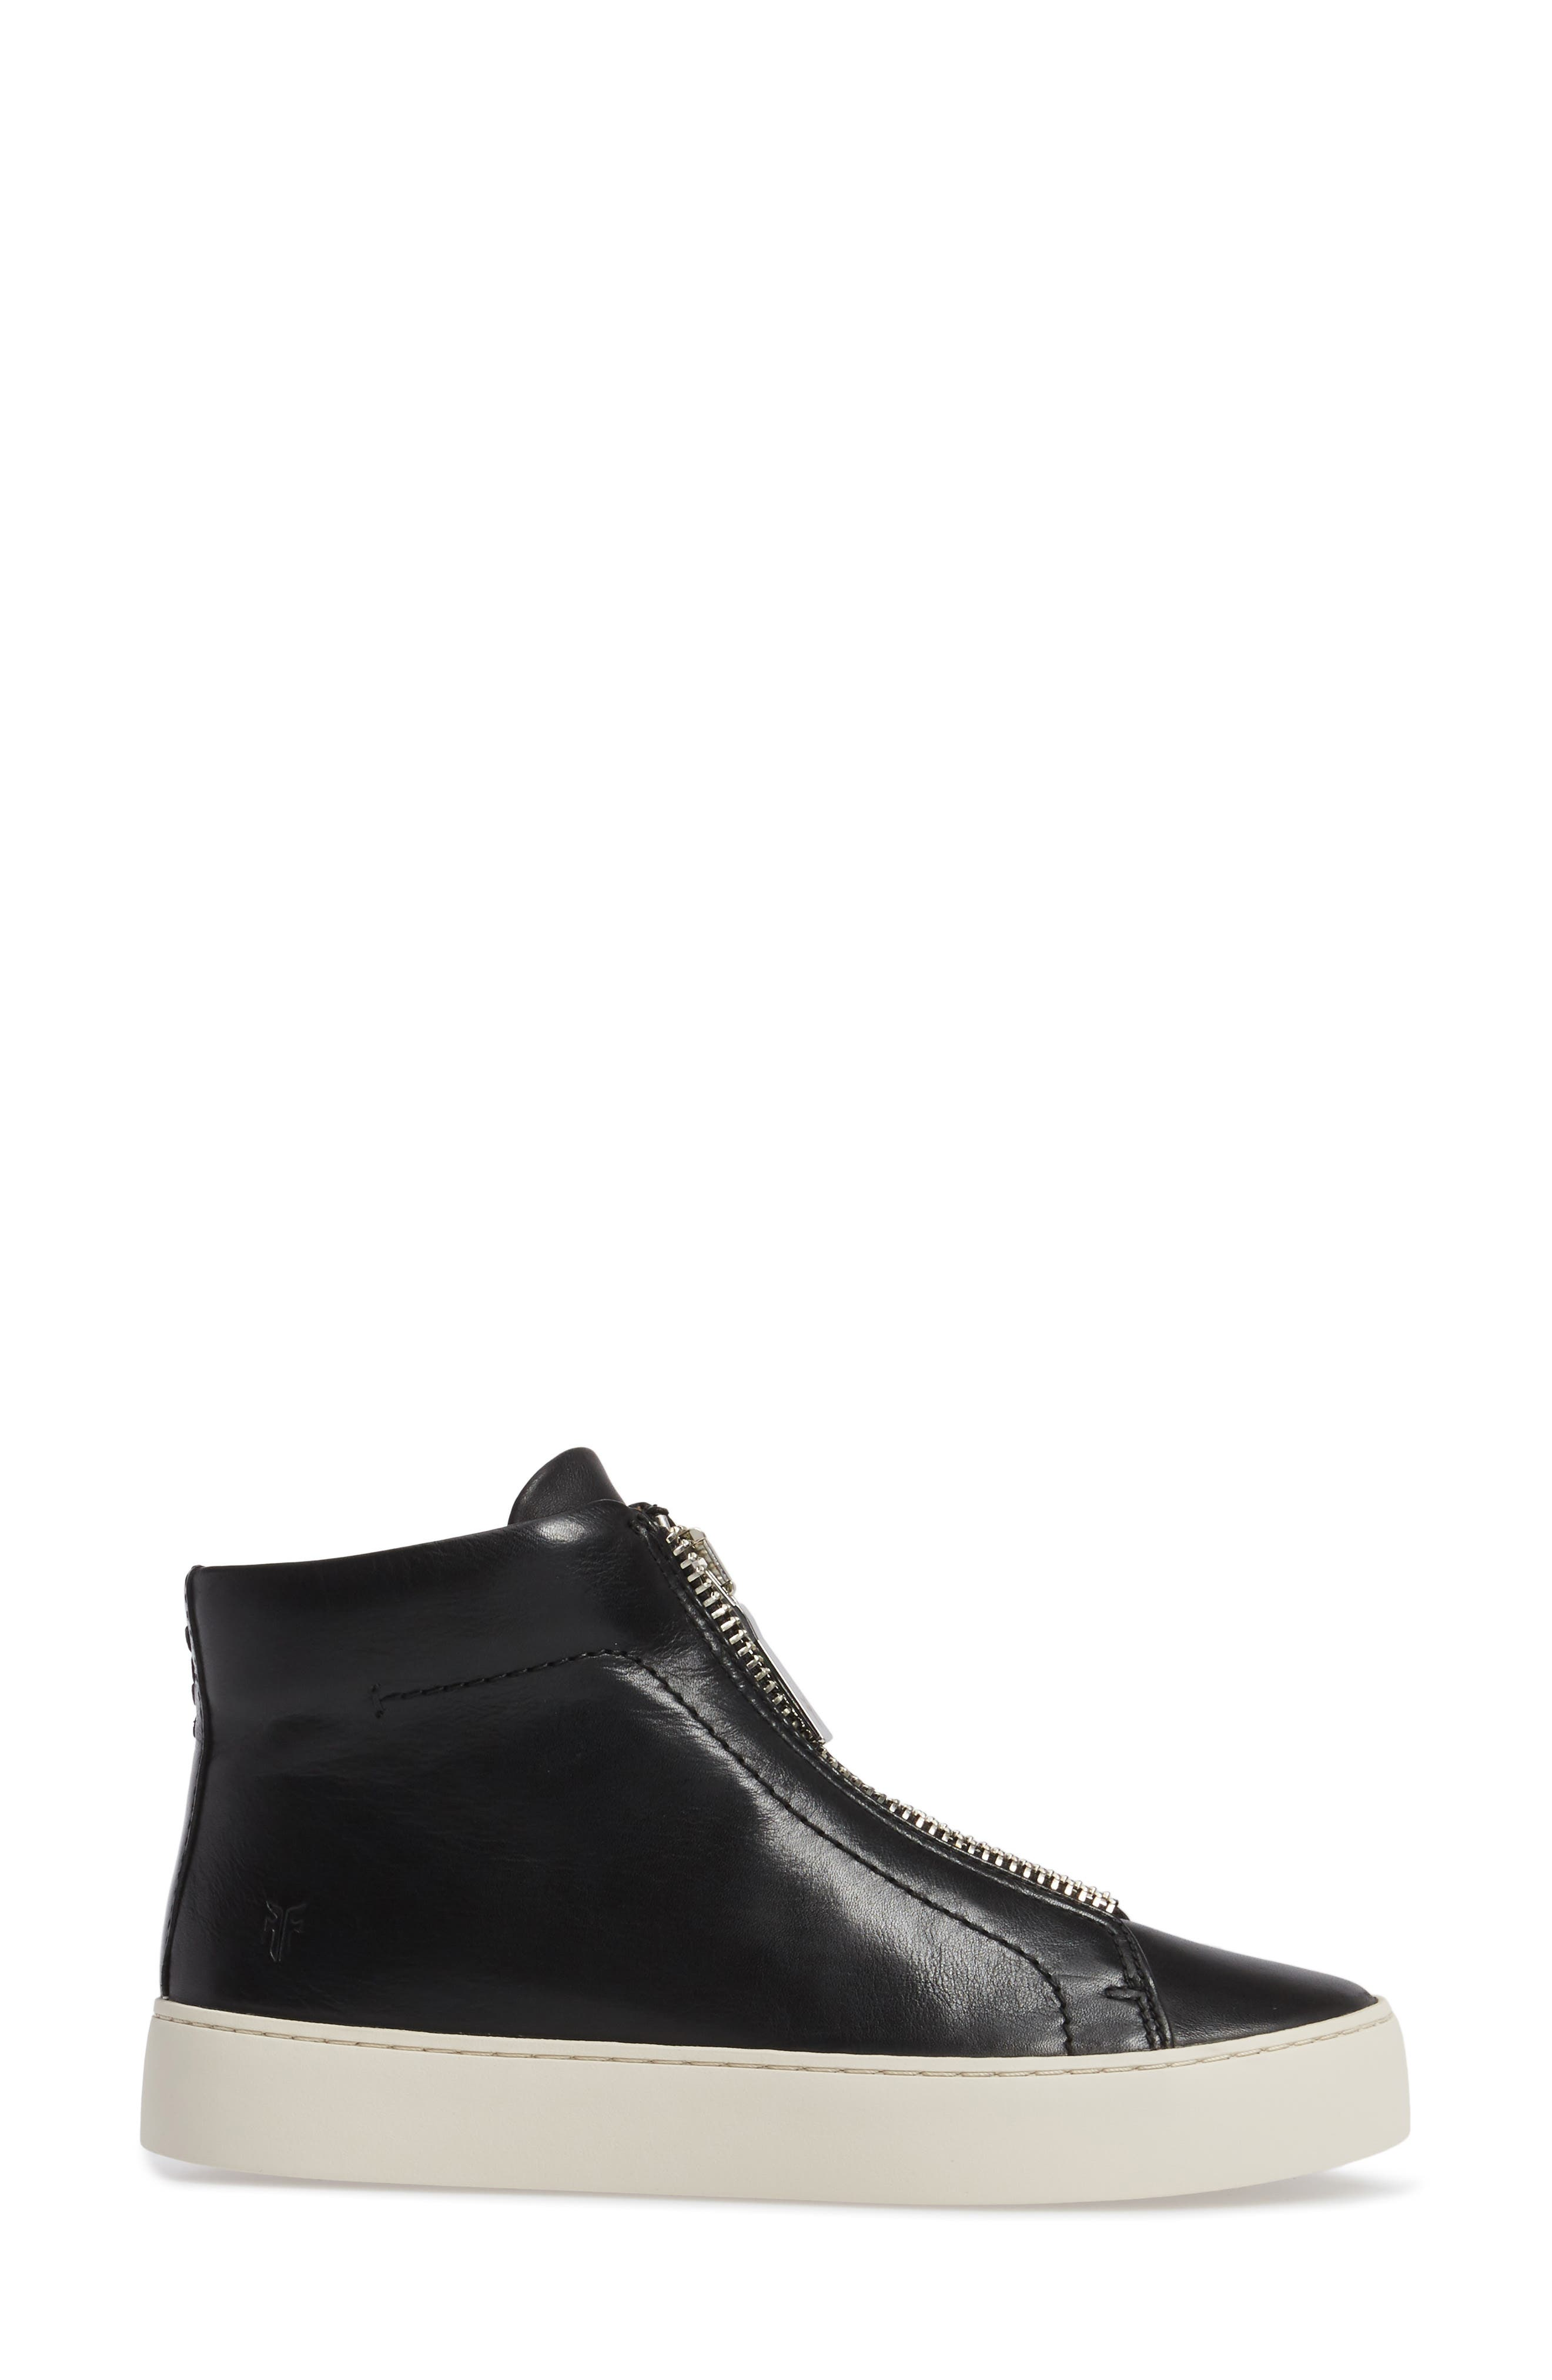 Lena Zip High Top Sneaker,                             Alternate thumbnail 3, color,                             BLACK LEATHER